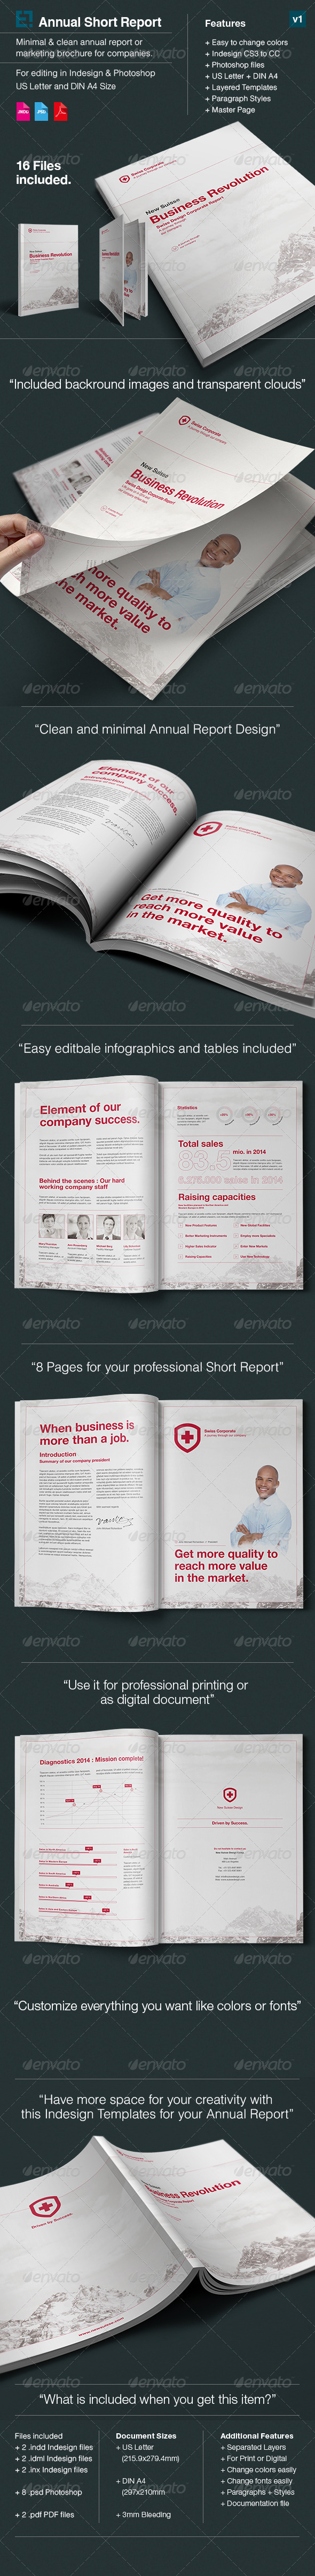 GraphicRiver Annual Report Suisse Design US Letter & DIN A4 7733967